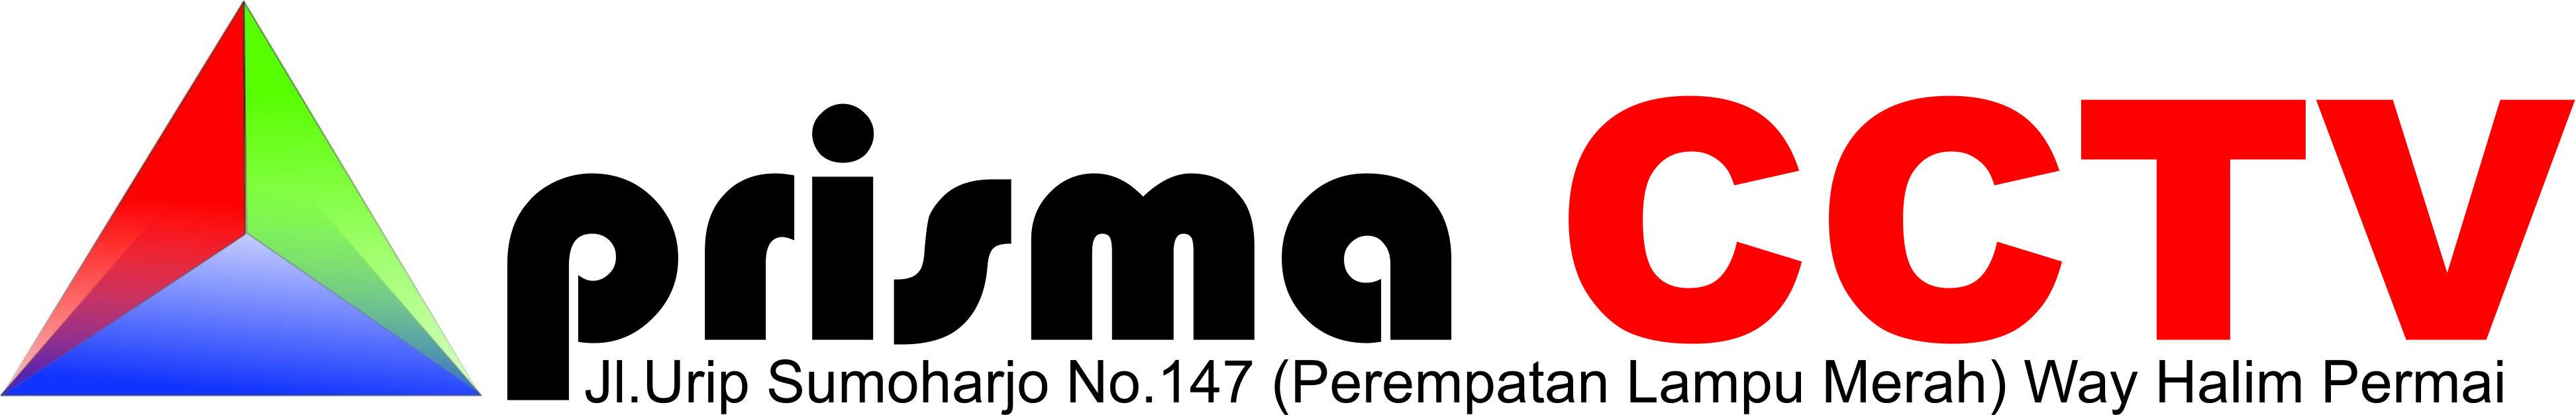 Prisma CCTV Lampung (Pusat Penjualan CCTV Di Lampung)